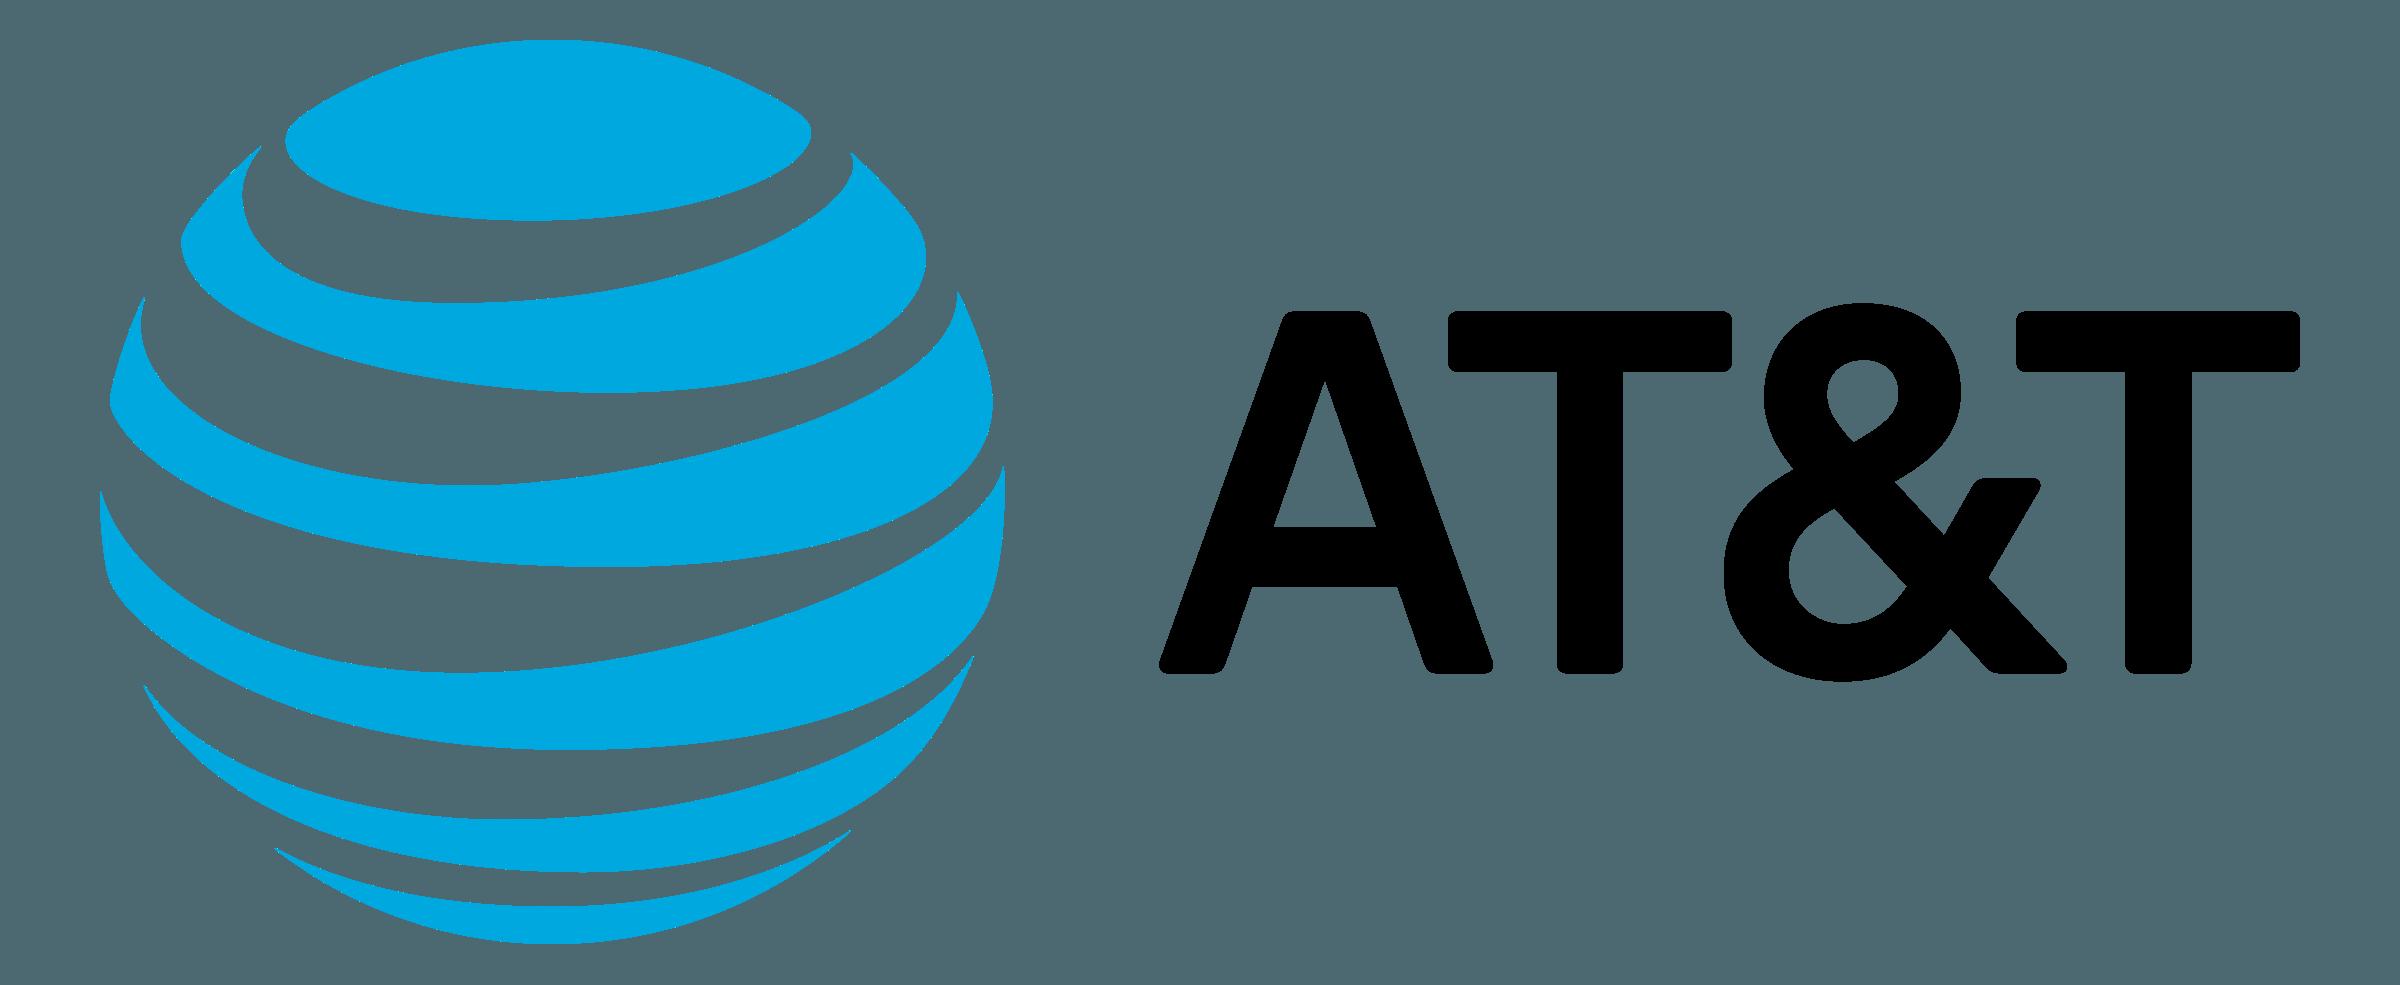 att-logo-transparent-1